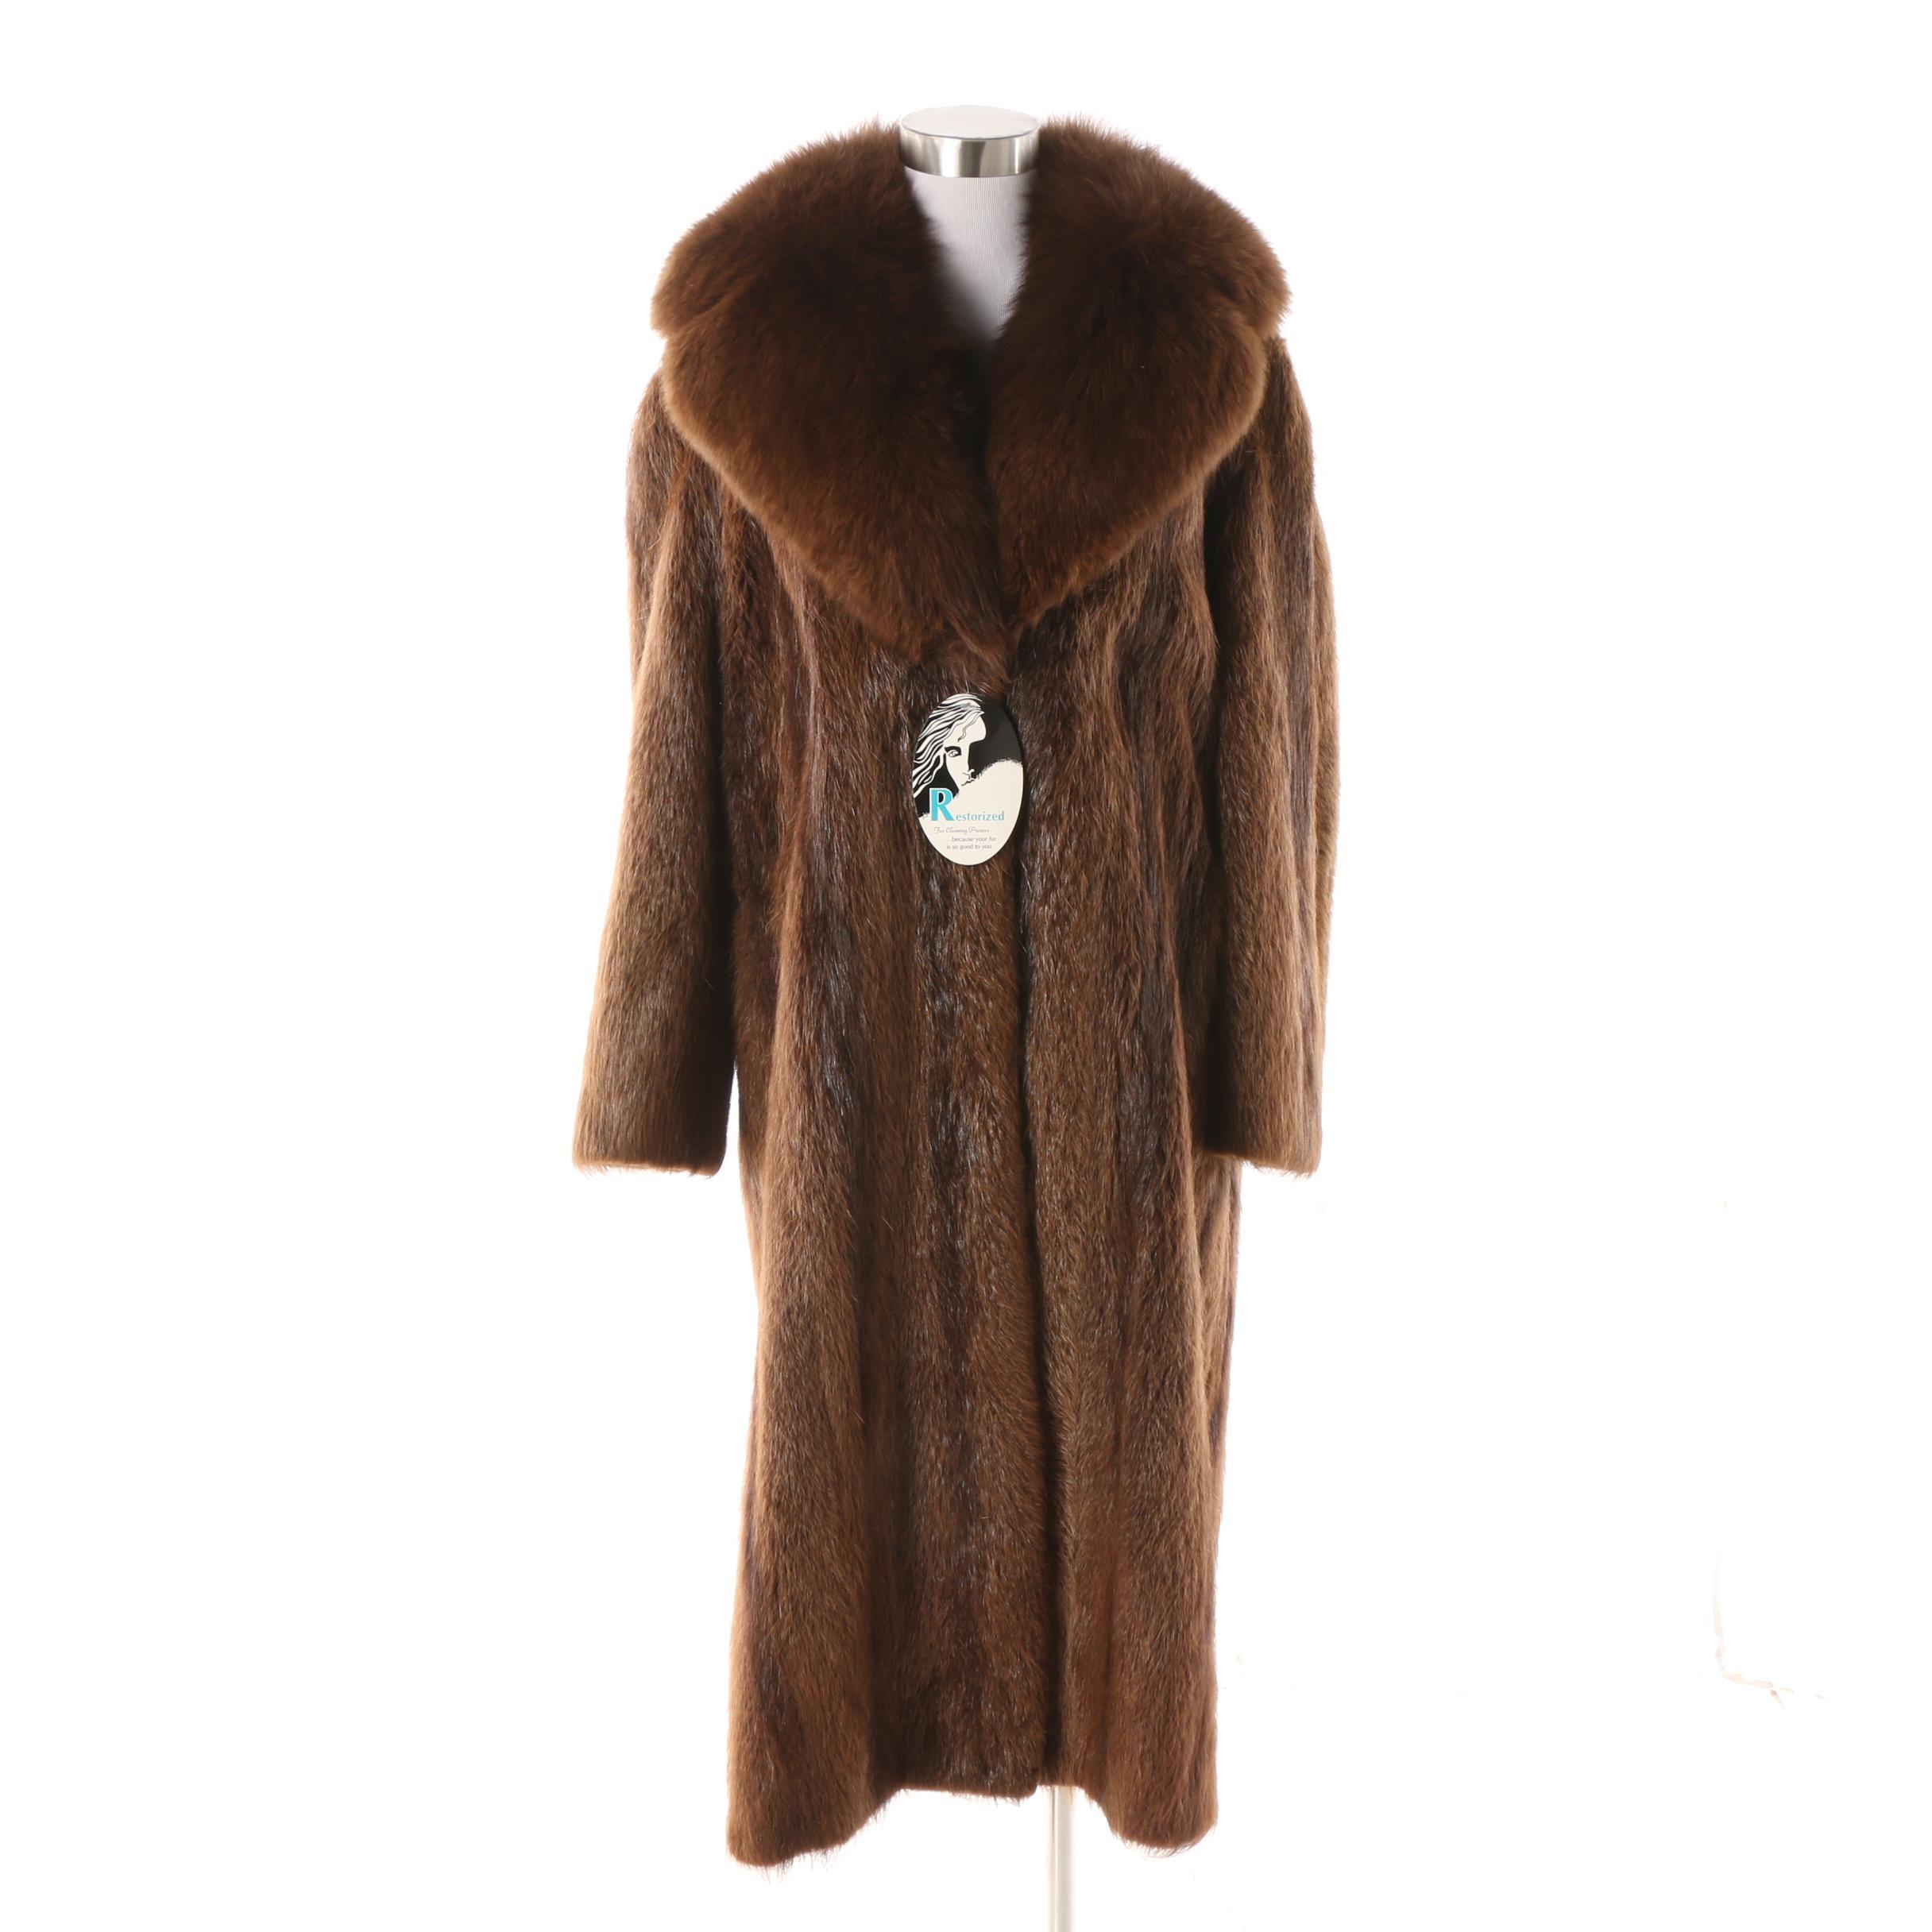 Women's Vintage Beaver Fur Dress Coat with Fox Fur Collar